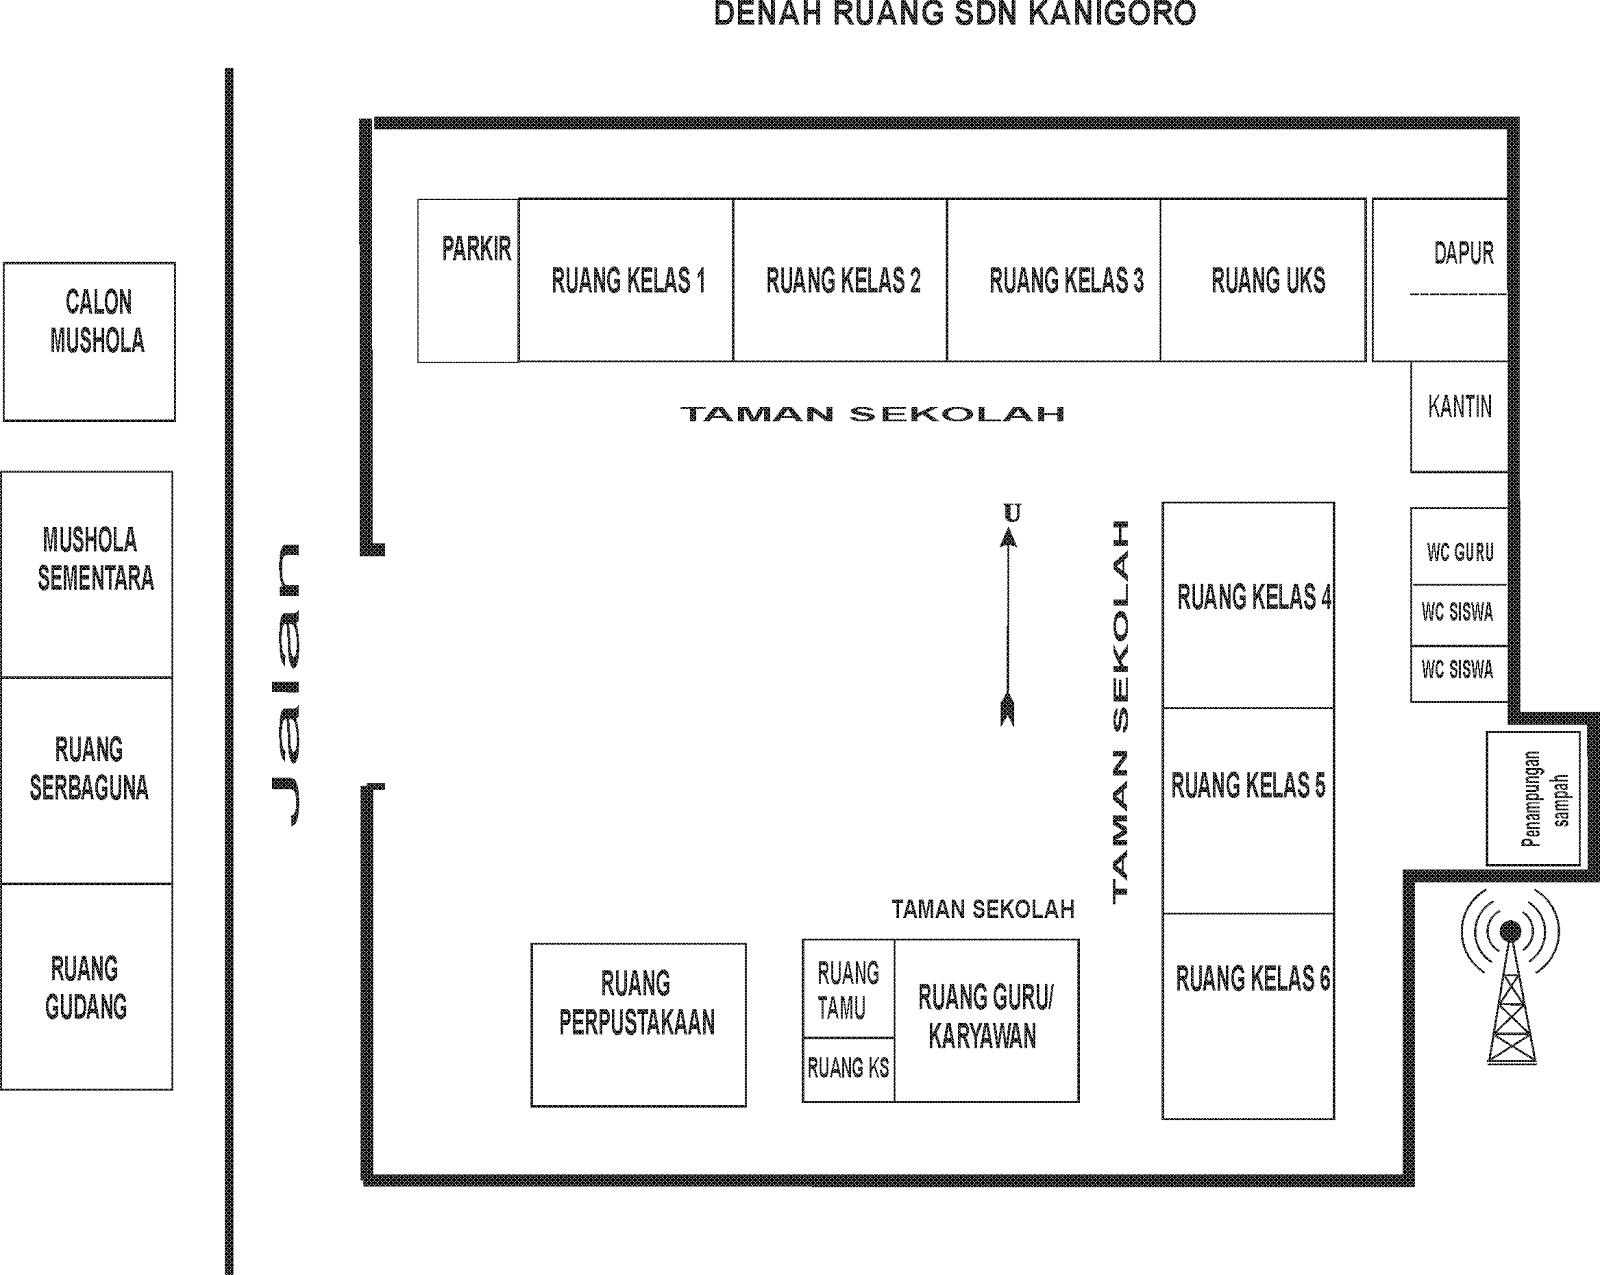 Sekolah Dasar Negeri Kanigoro: Denah ruang SDN Kanigoro